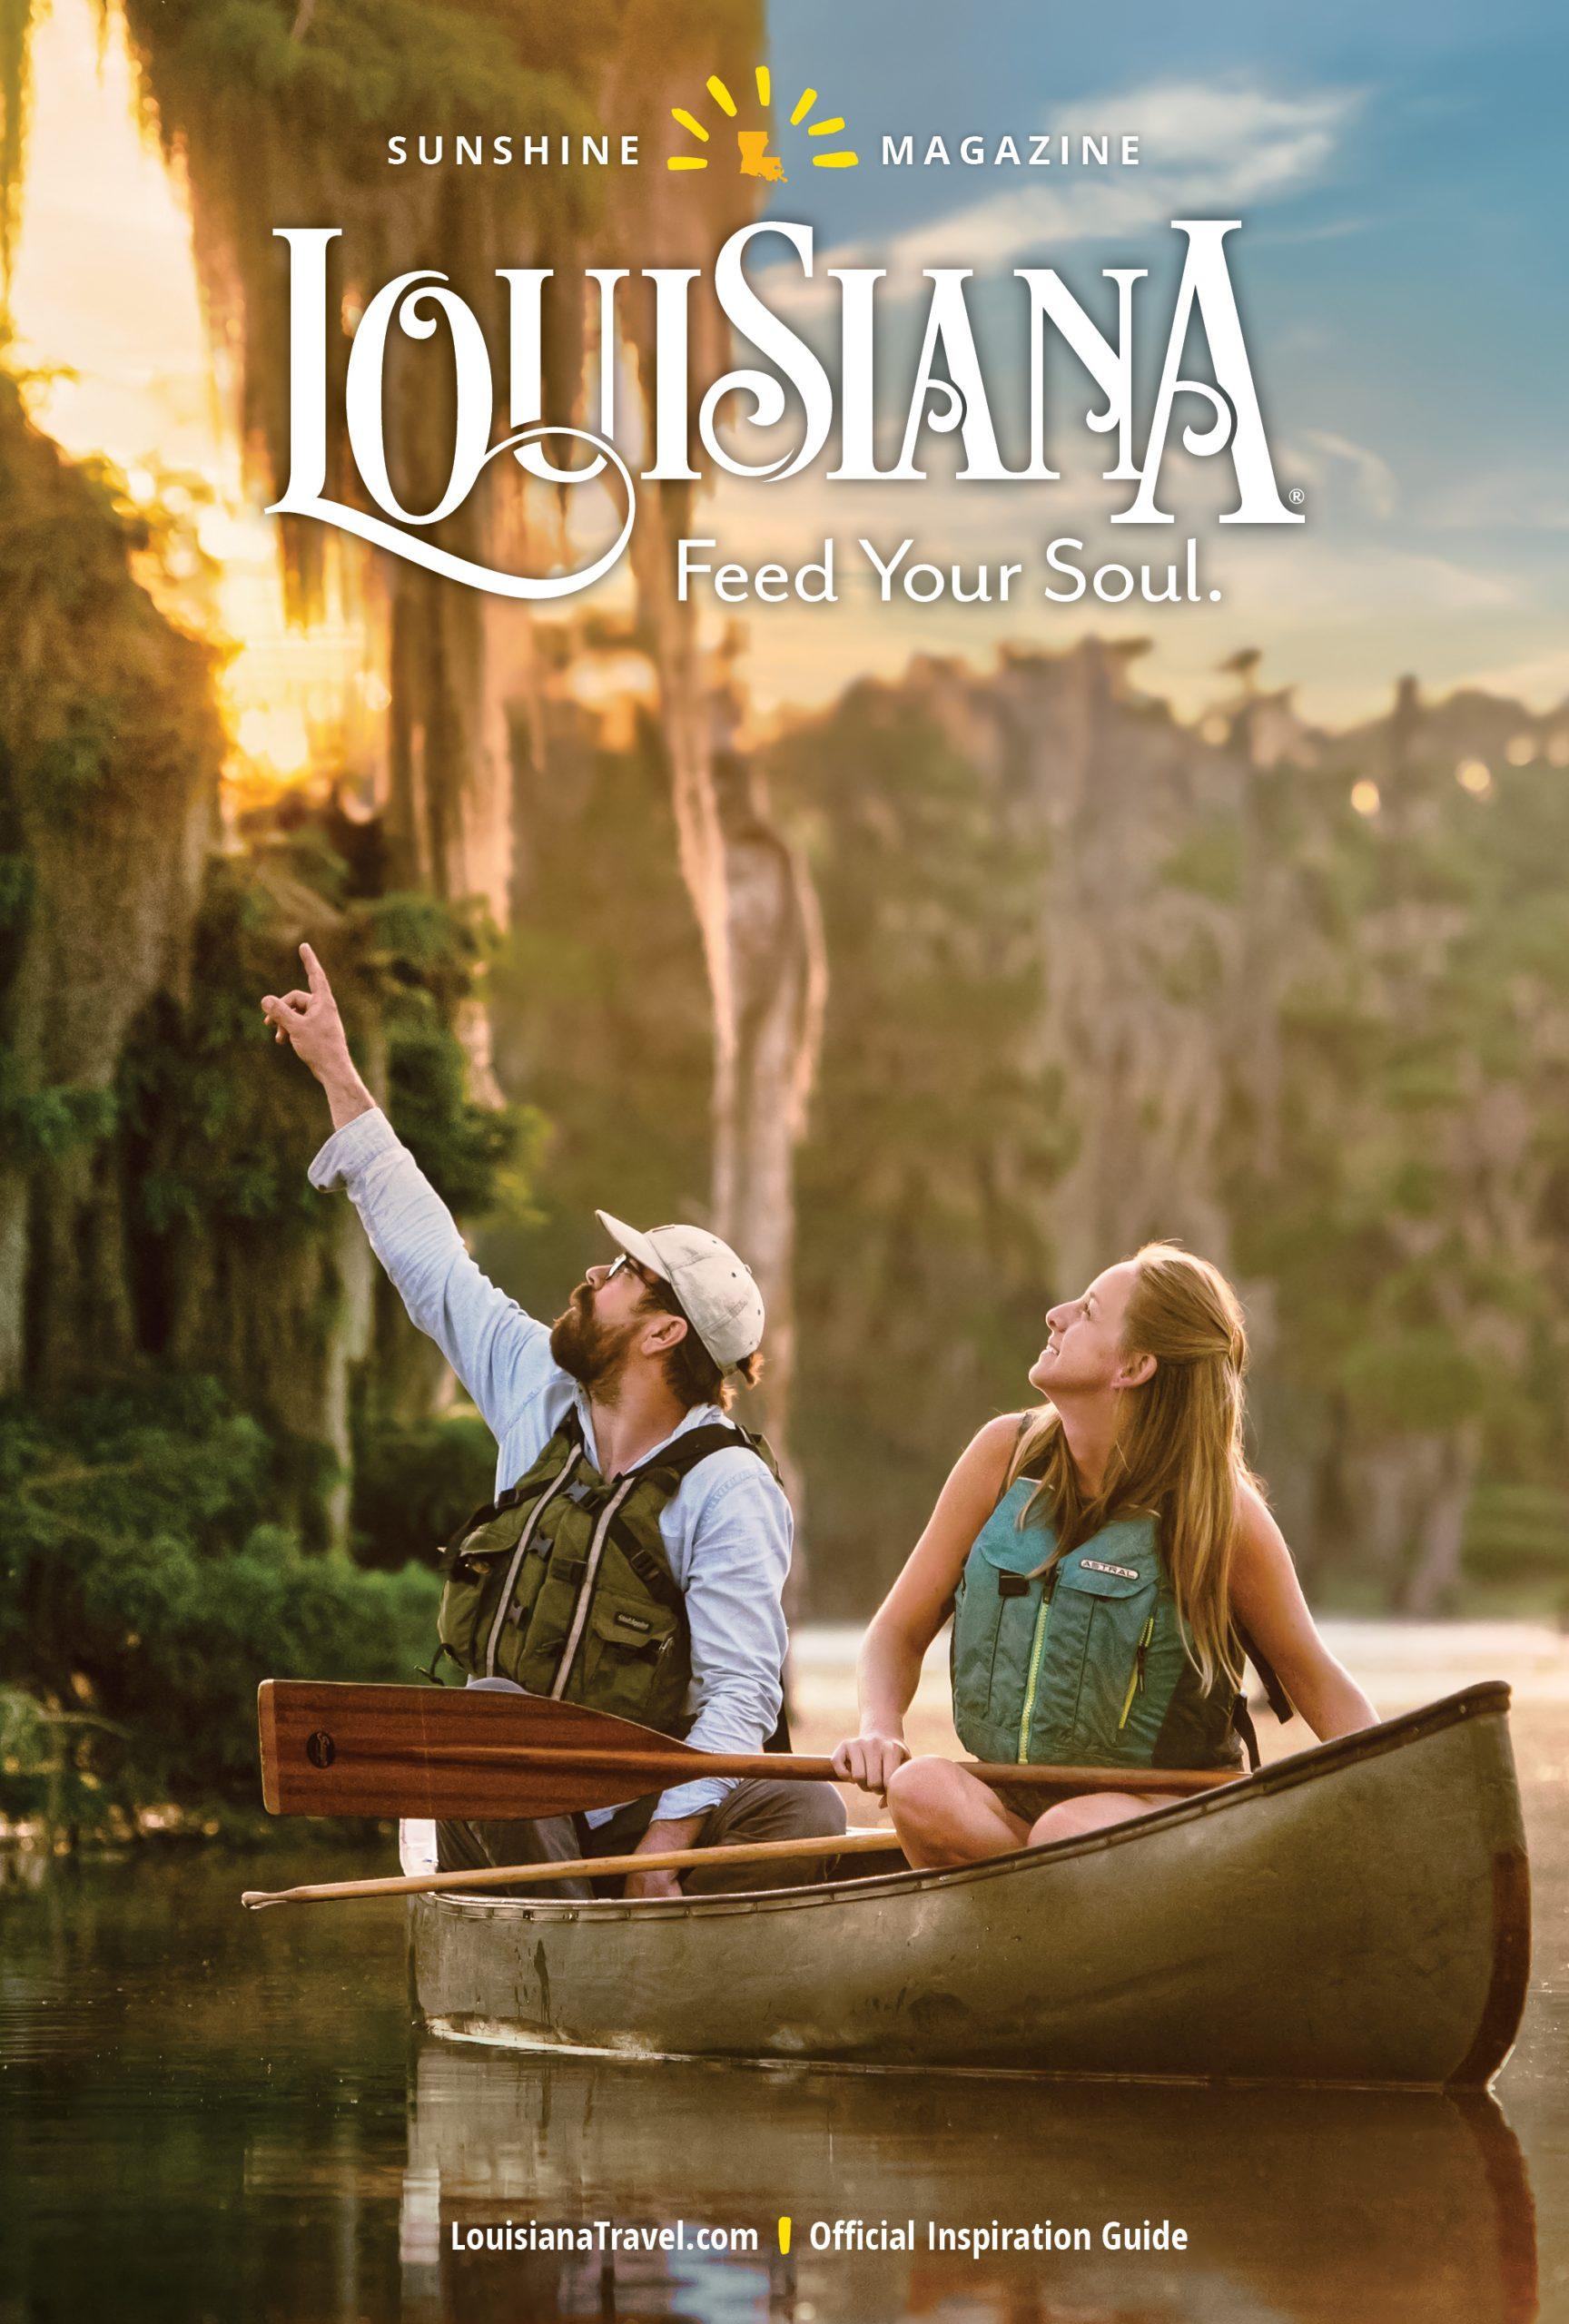 louisiana sunshine magazine cover